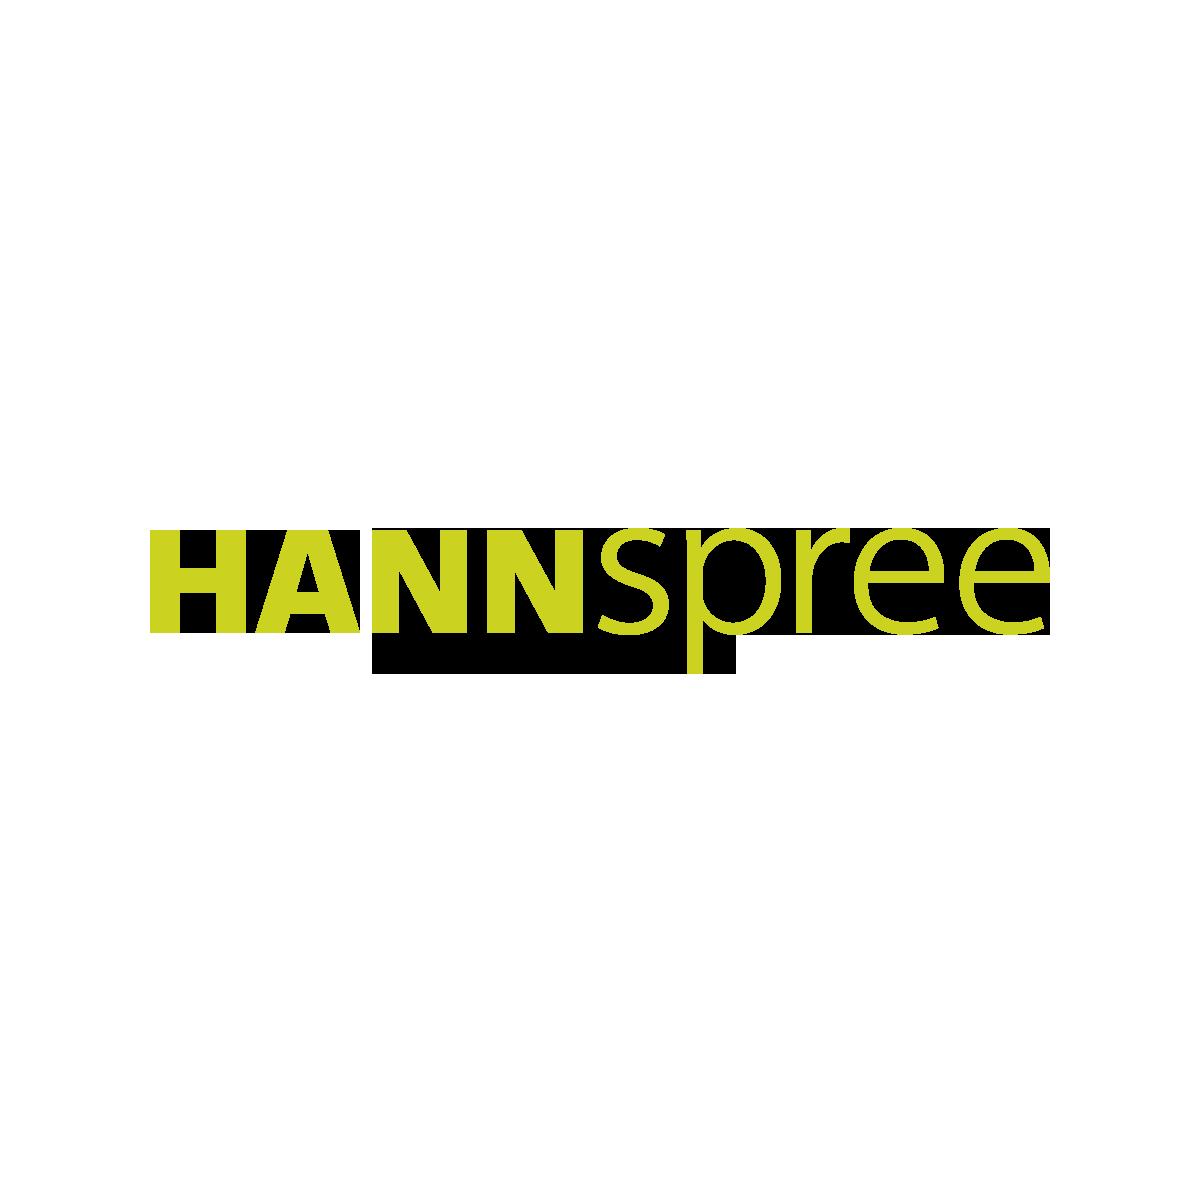 Hannspree Europe GmbH